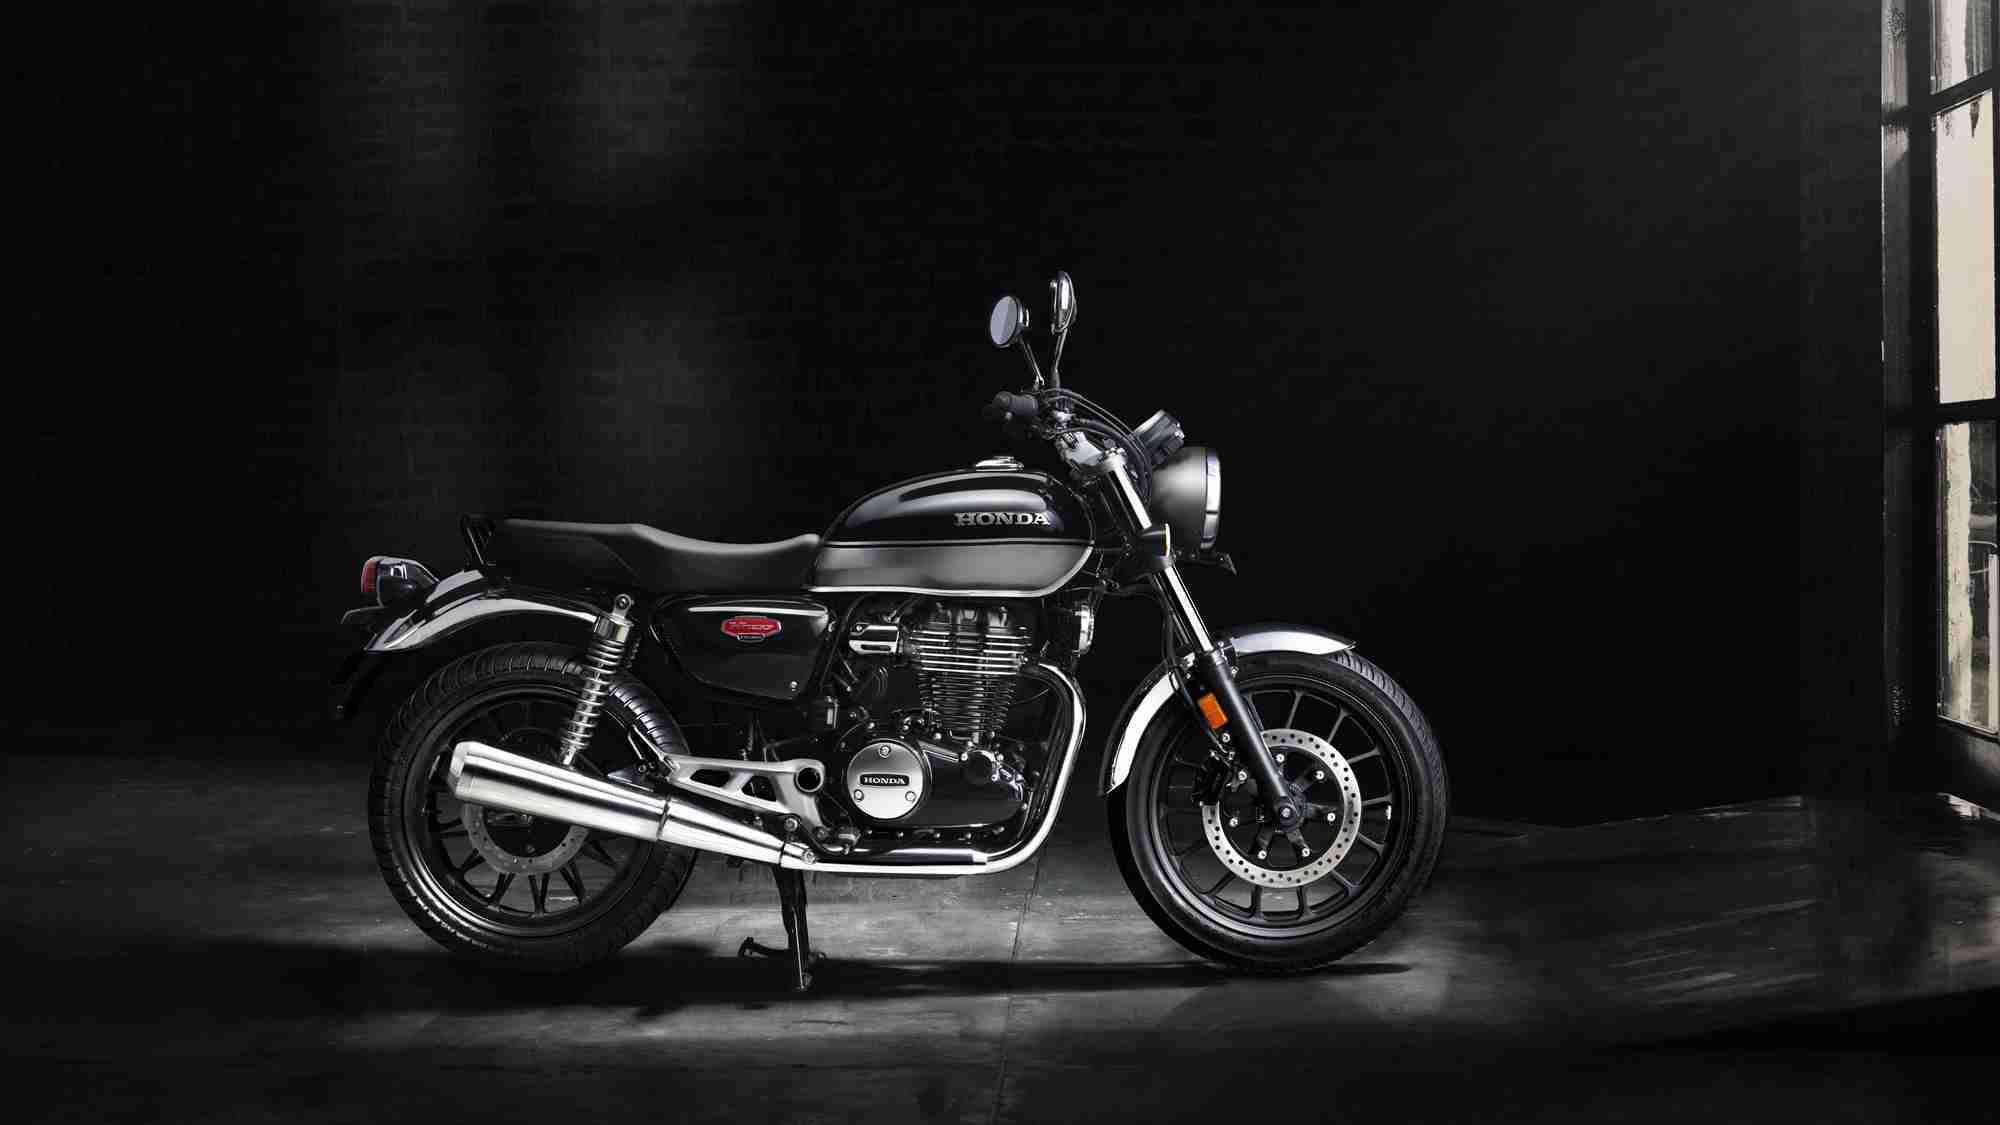 Honda CB 350 wallpapers